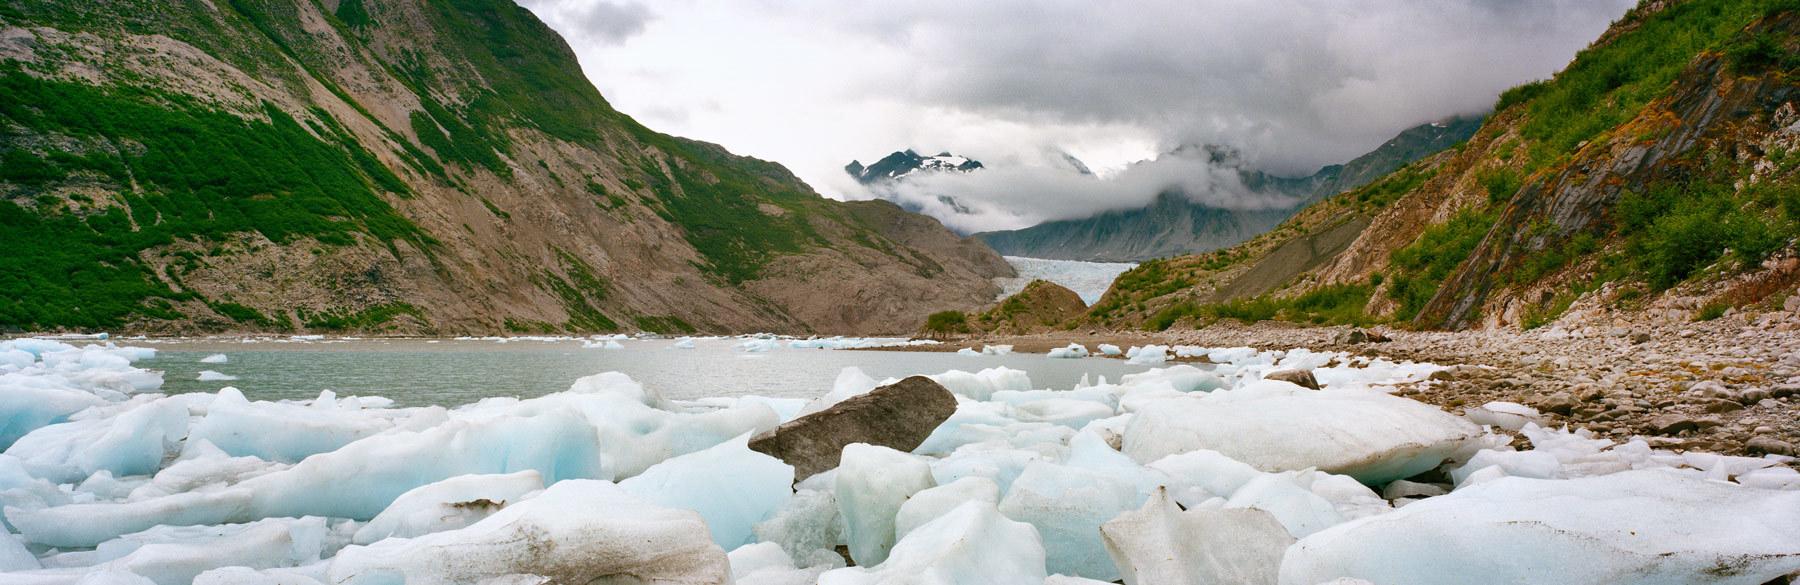 Lightbox_jorstad_glacier_bay_pawohi